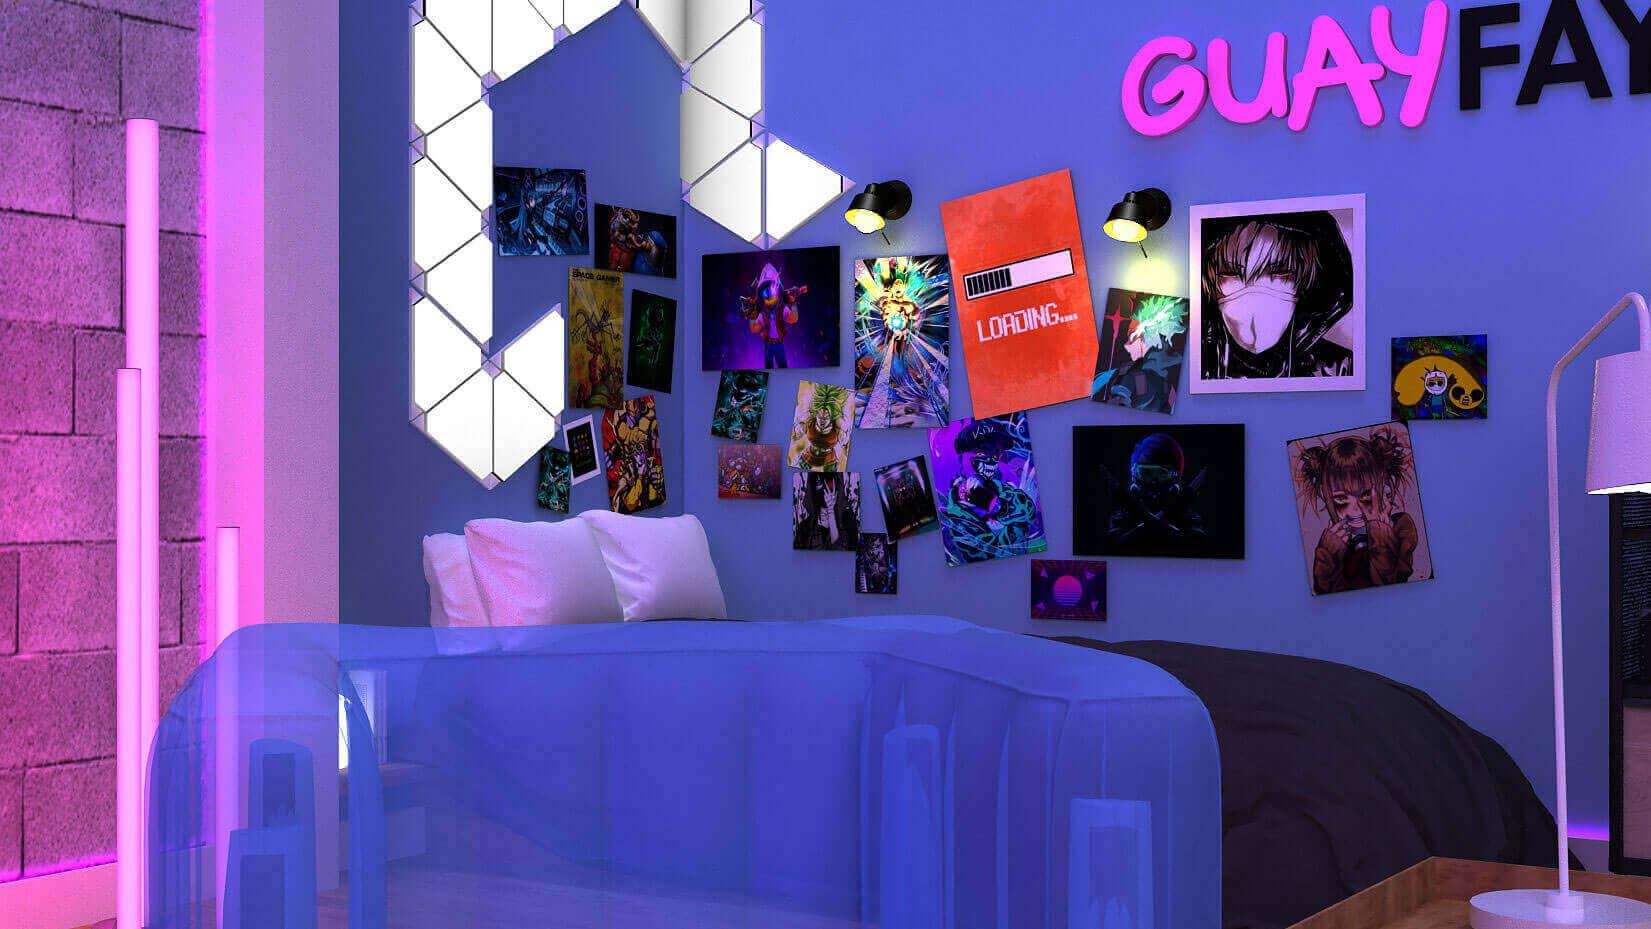 GuayFay decorado